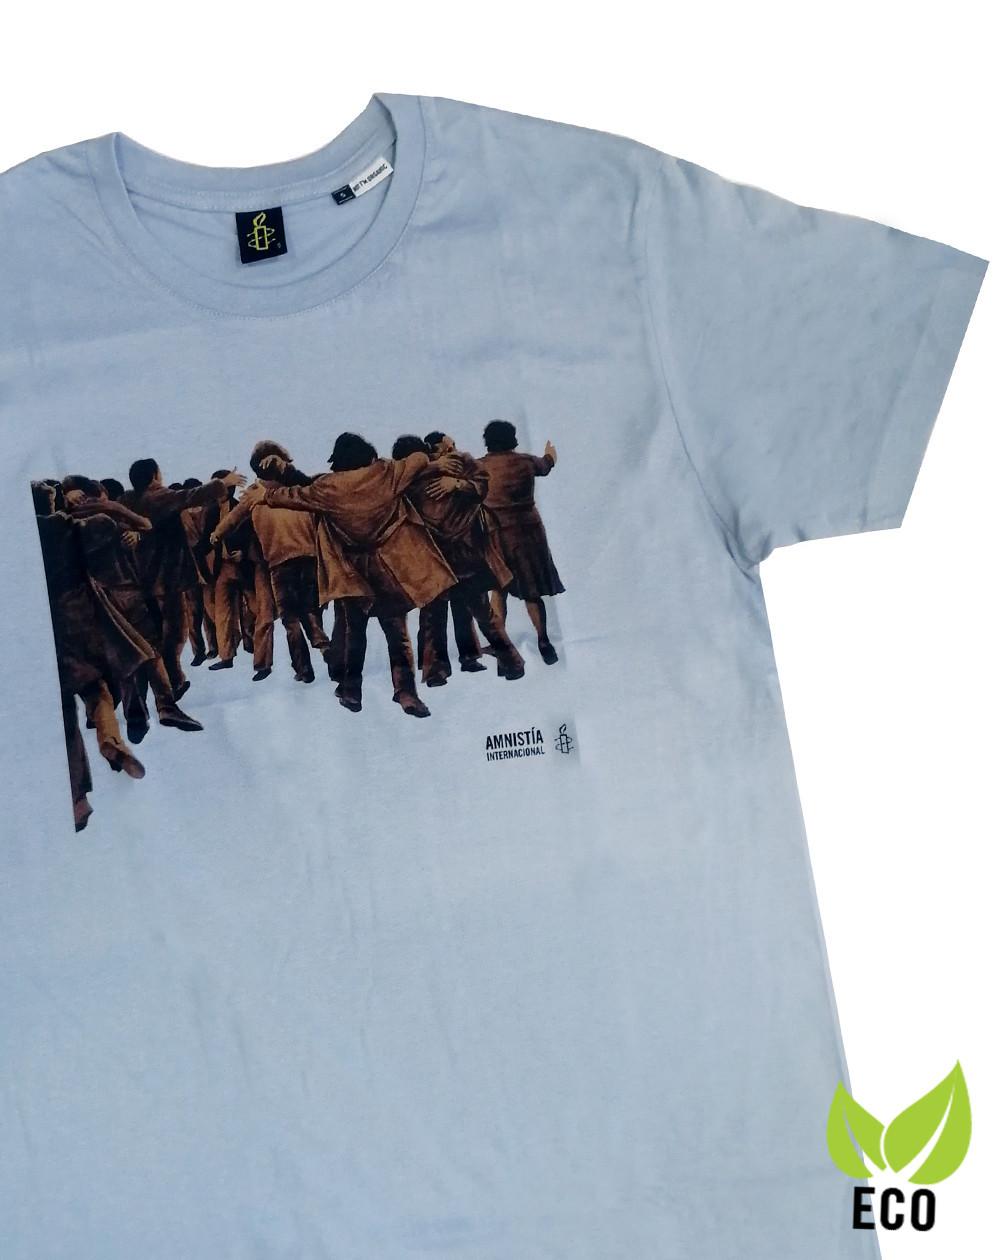 Camiseta chico Juan Genovés Amnistía Internacional azul